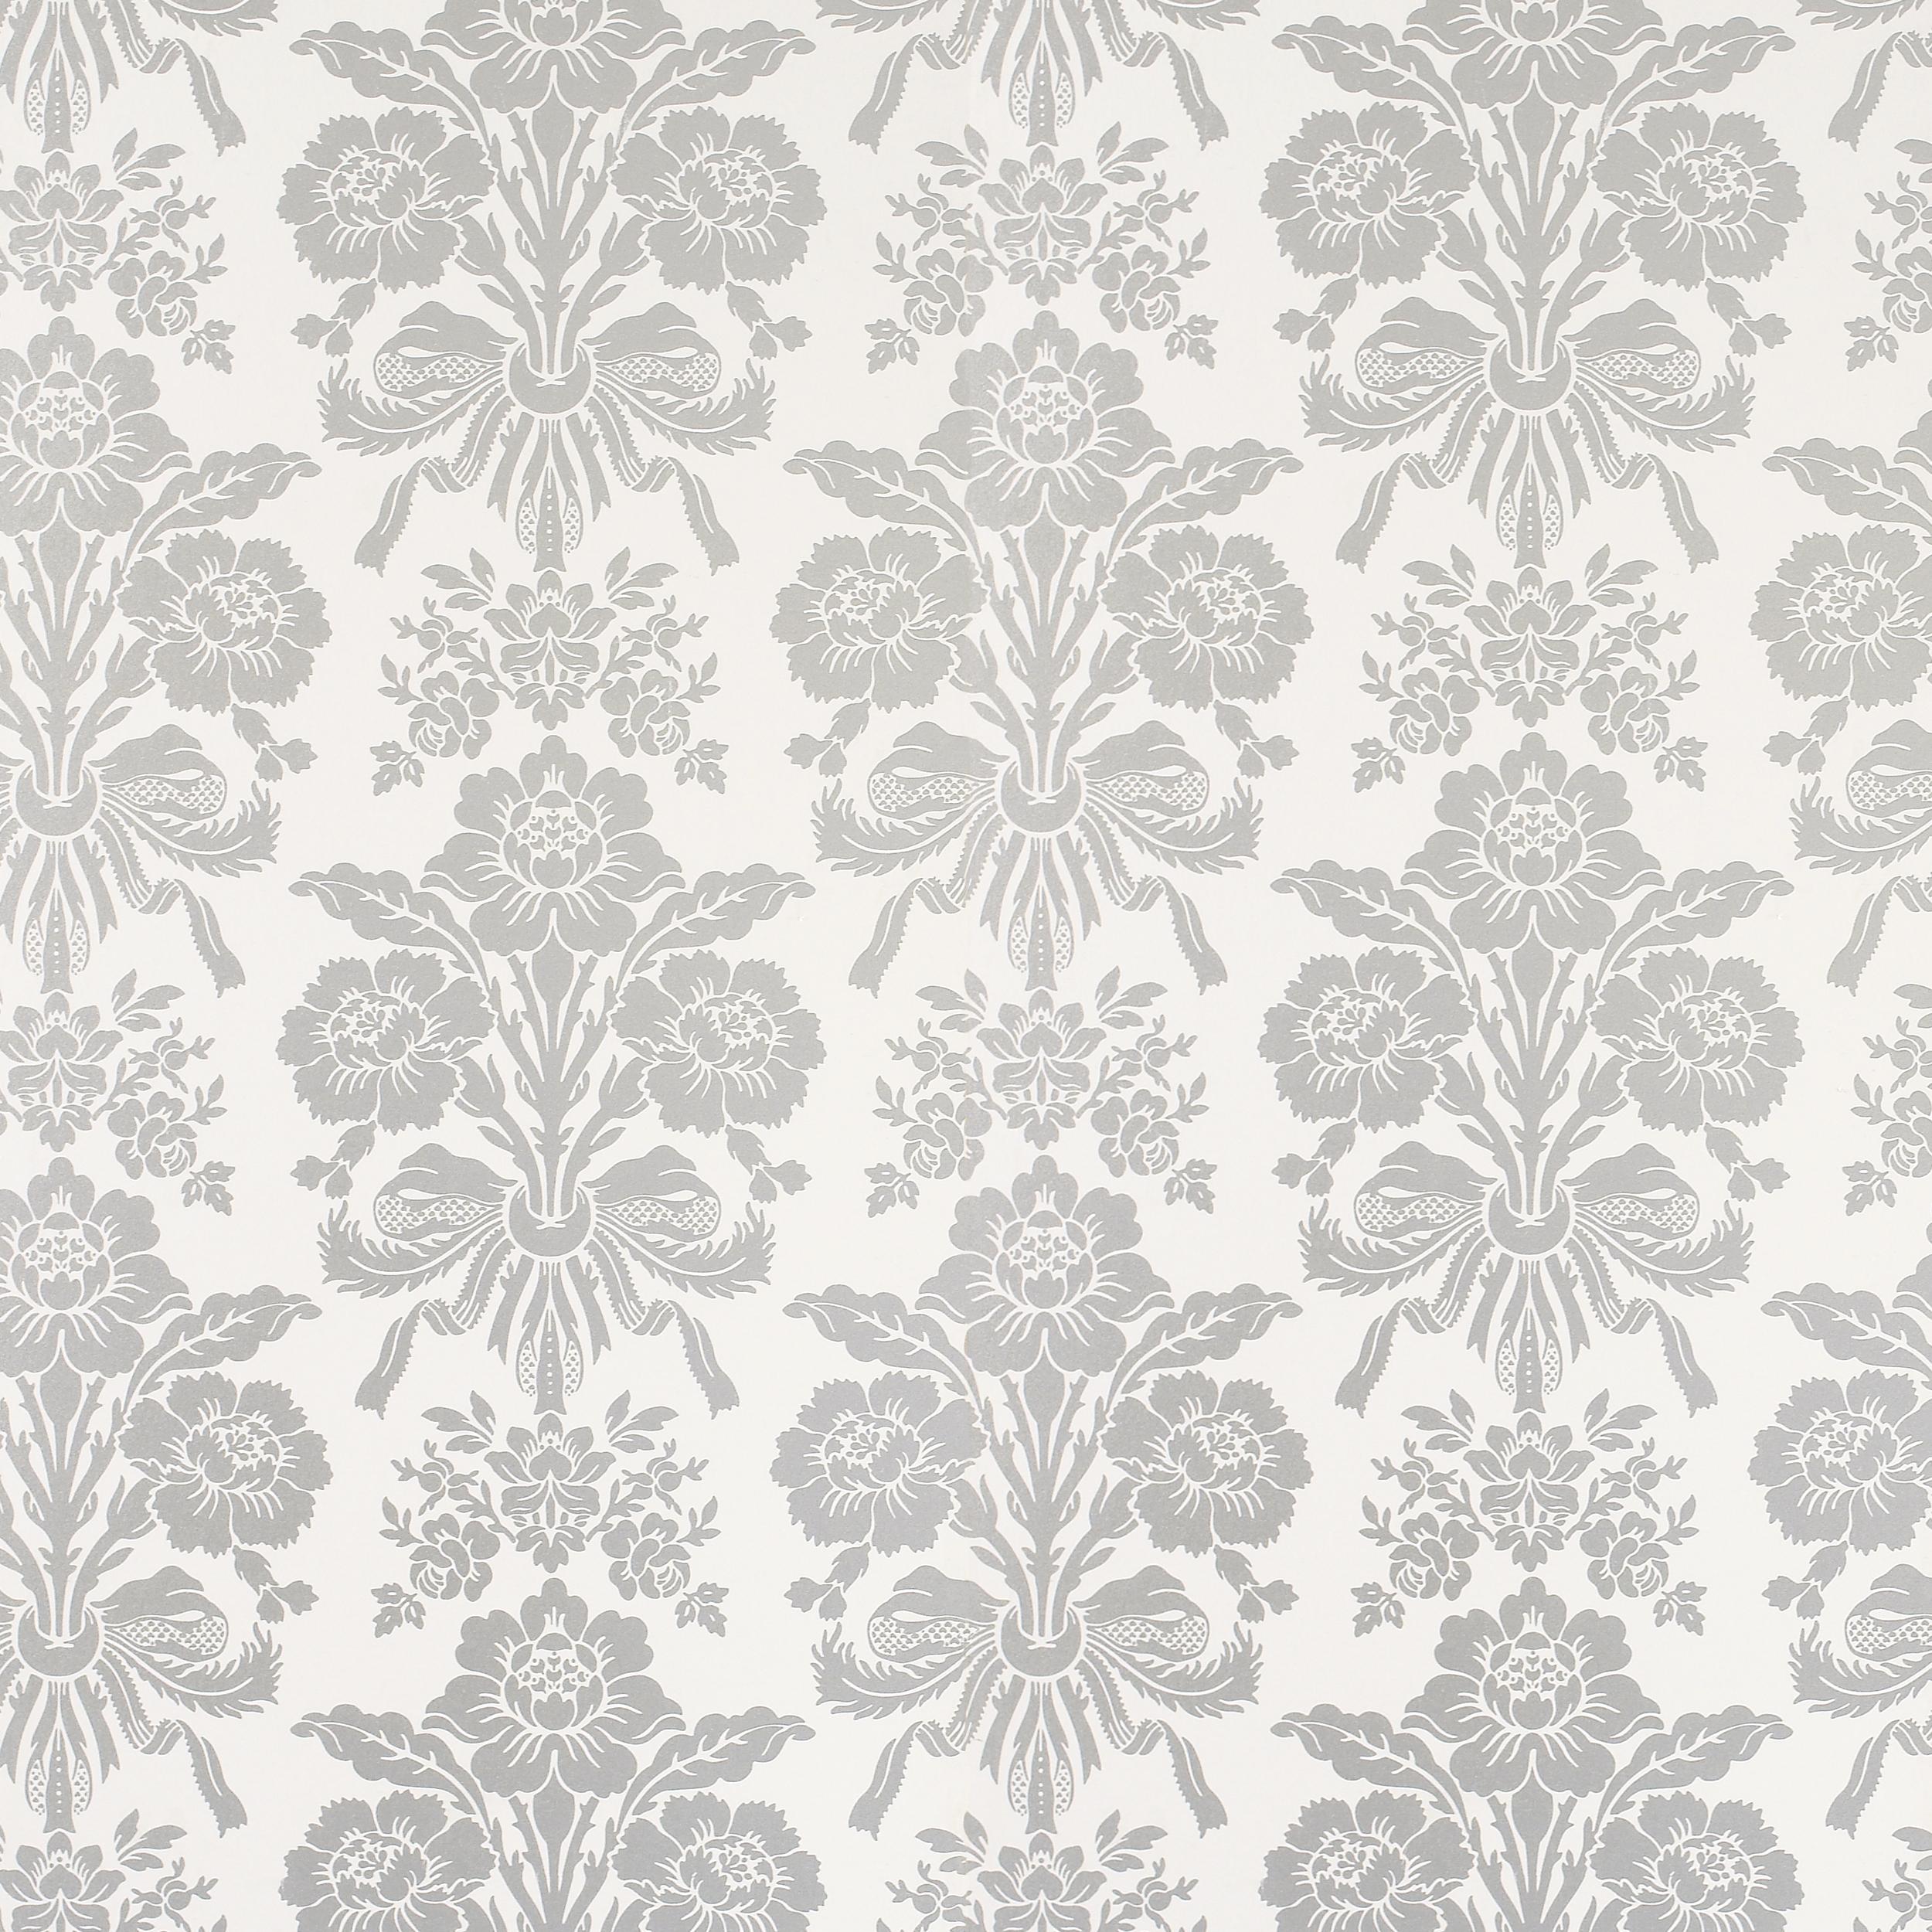 Home Decorating Wallpaper Tatton Silver Damask Wallpaper 2500x2500